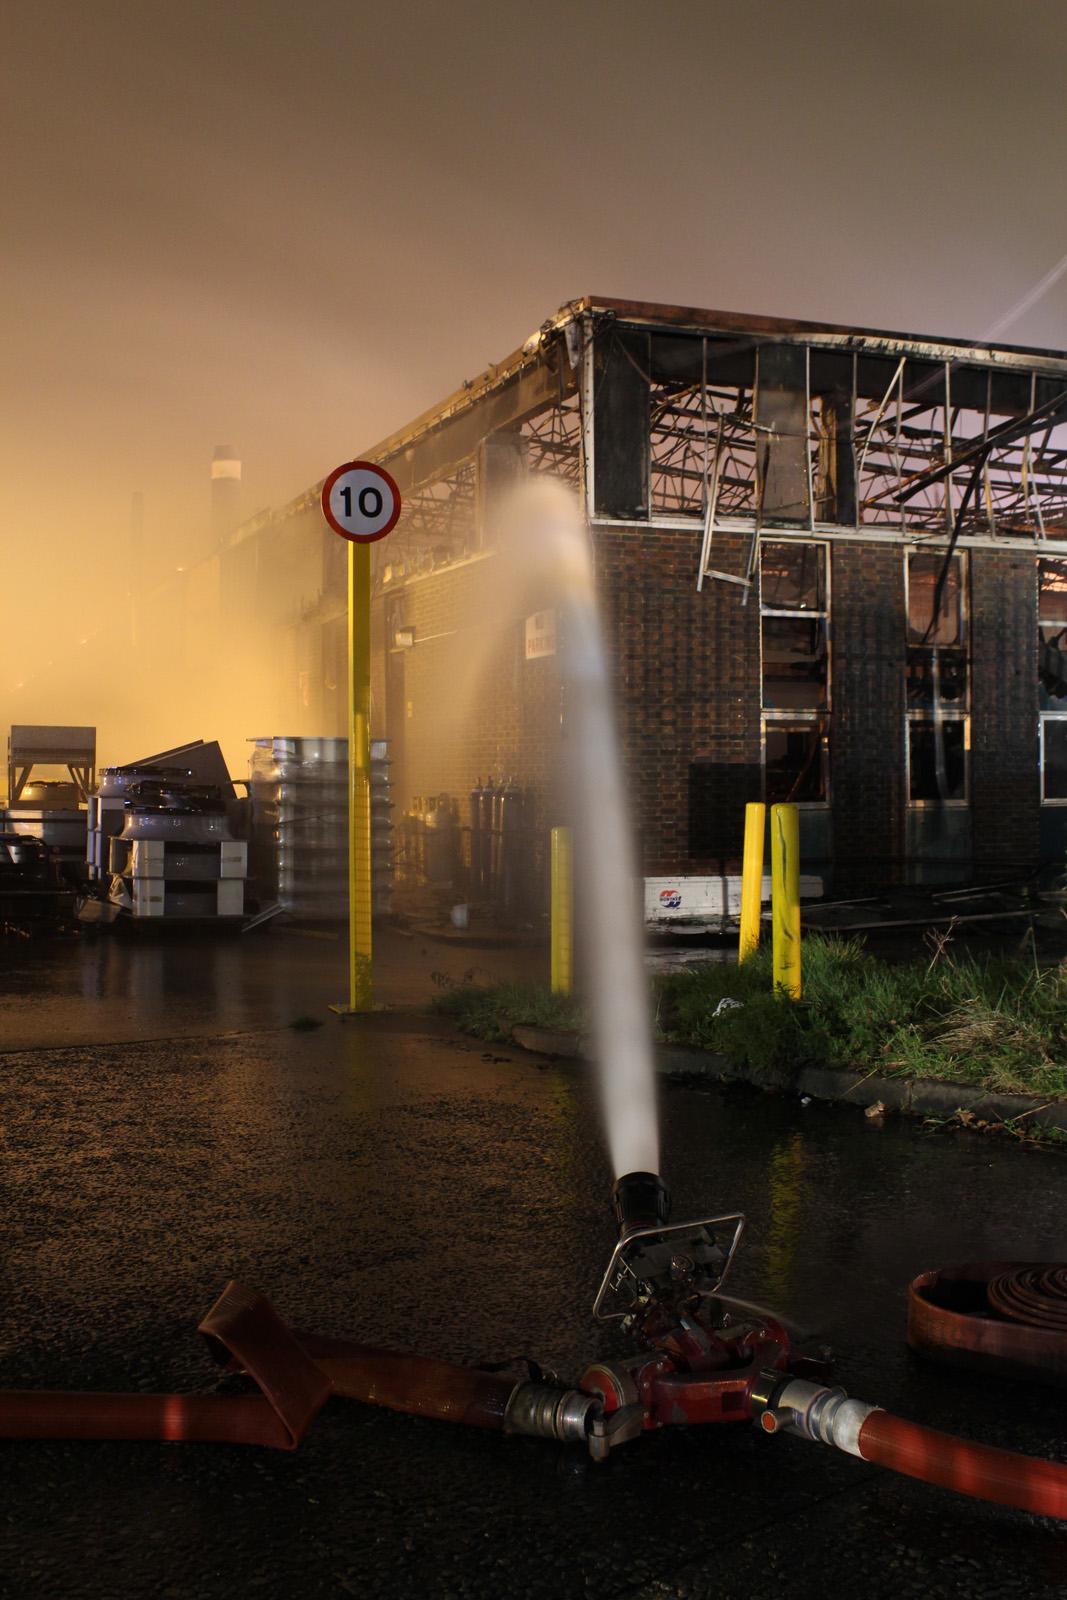 Fareham Retail Park fire